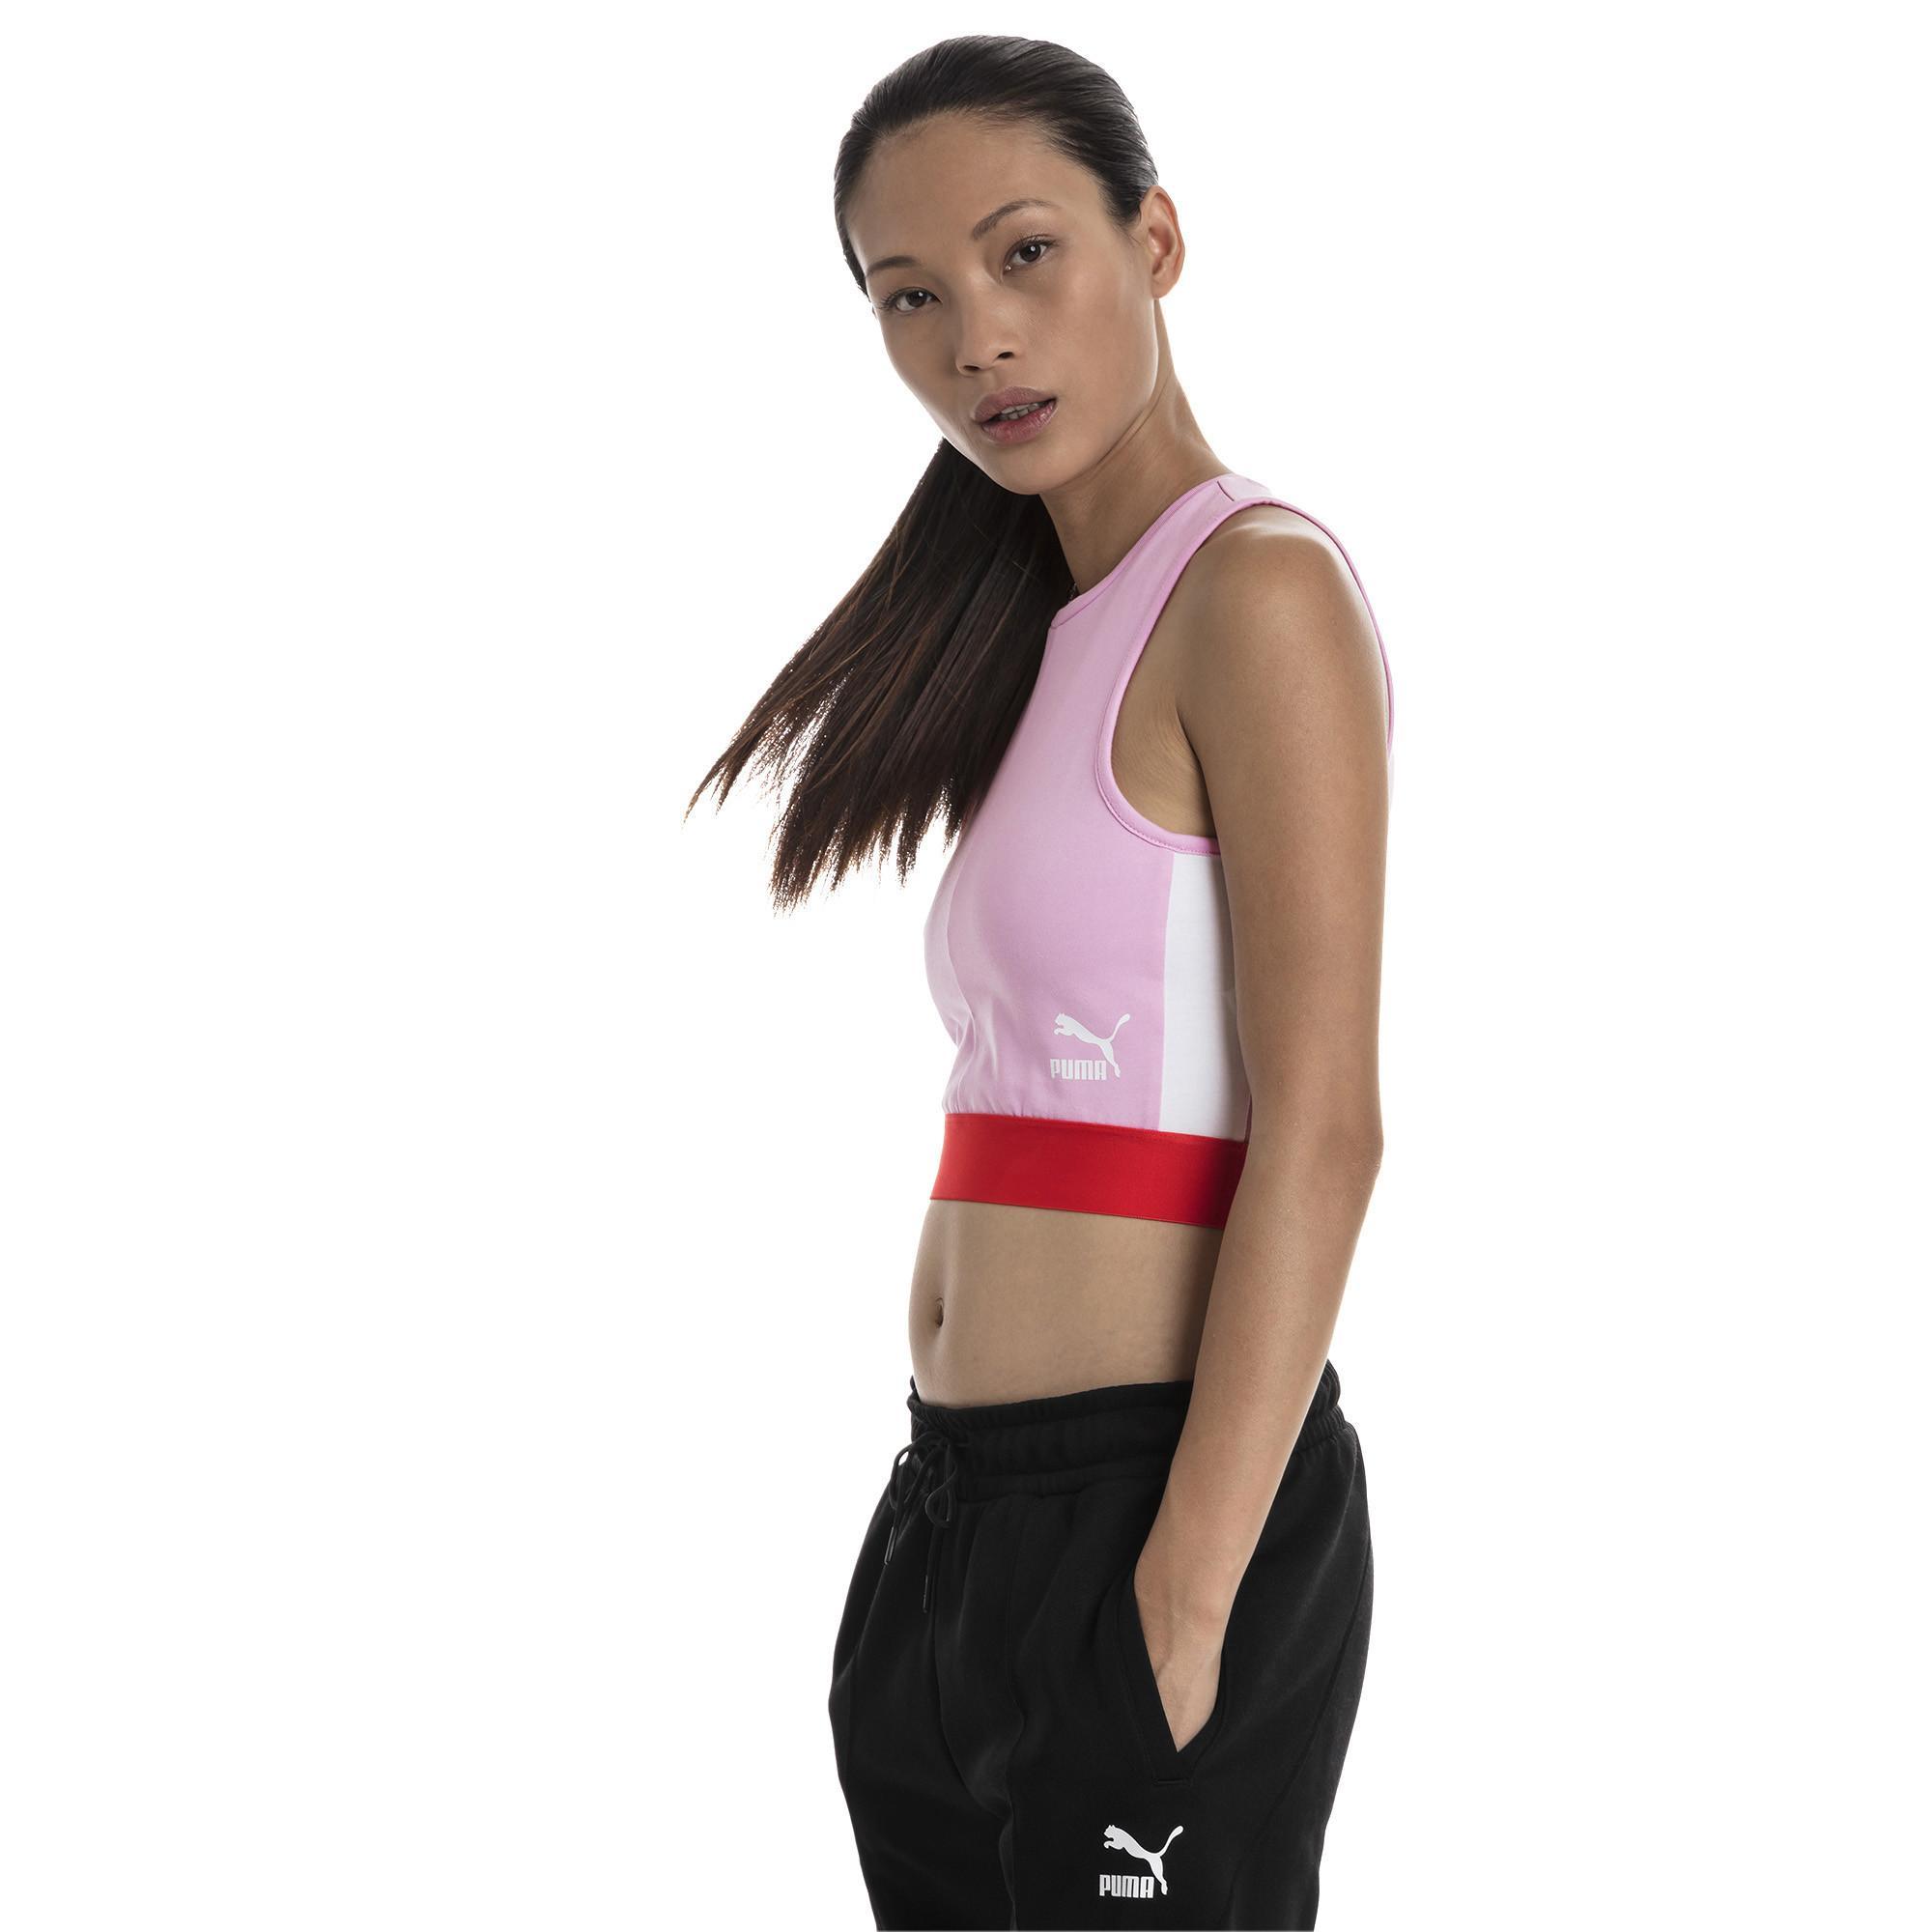 cbf25a740f496c Pink Xtg Puma Lyst Top In Women s Crop x7Y55nvTR